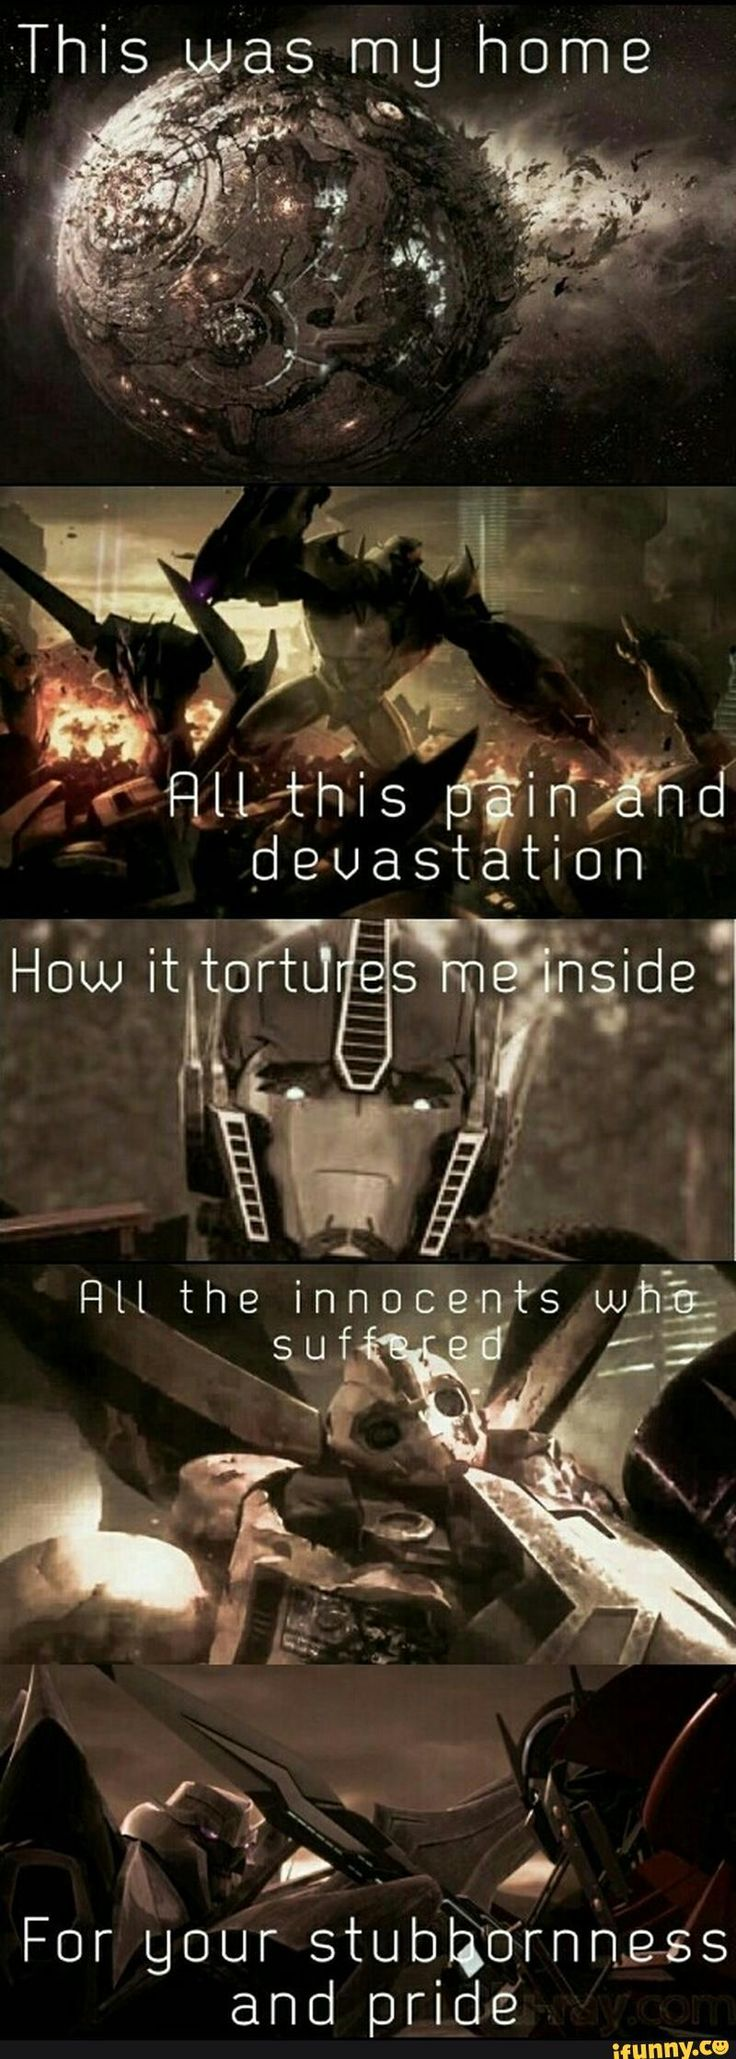 When I was reading this I heard Optimus Prime's voice... sad